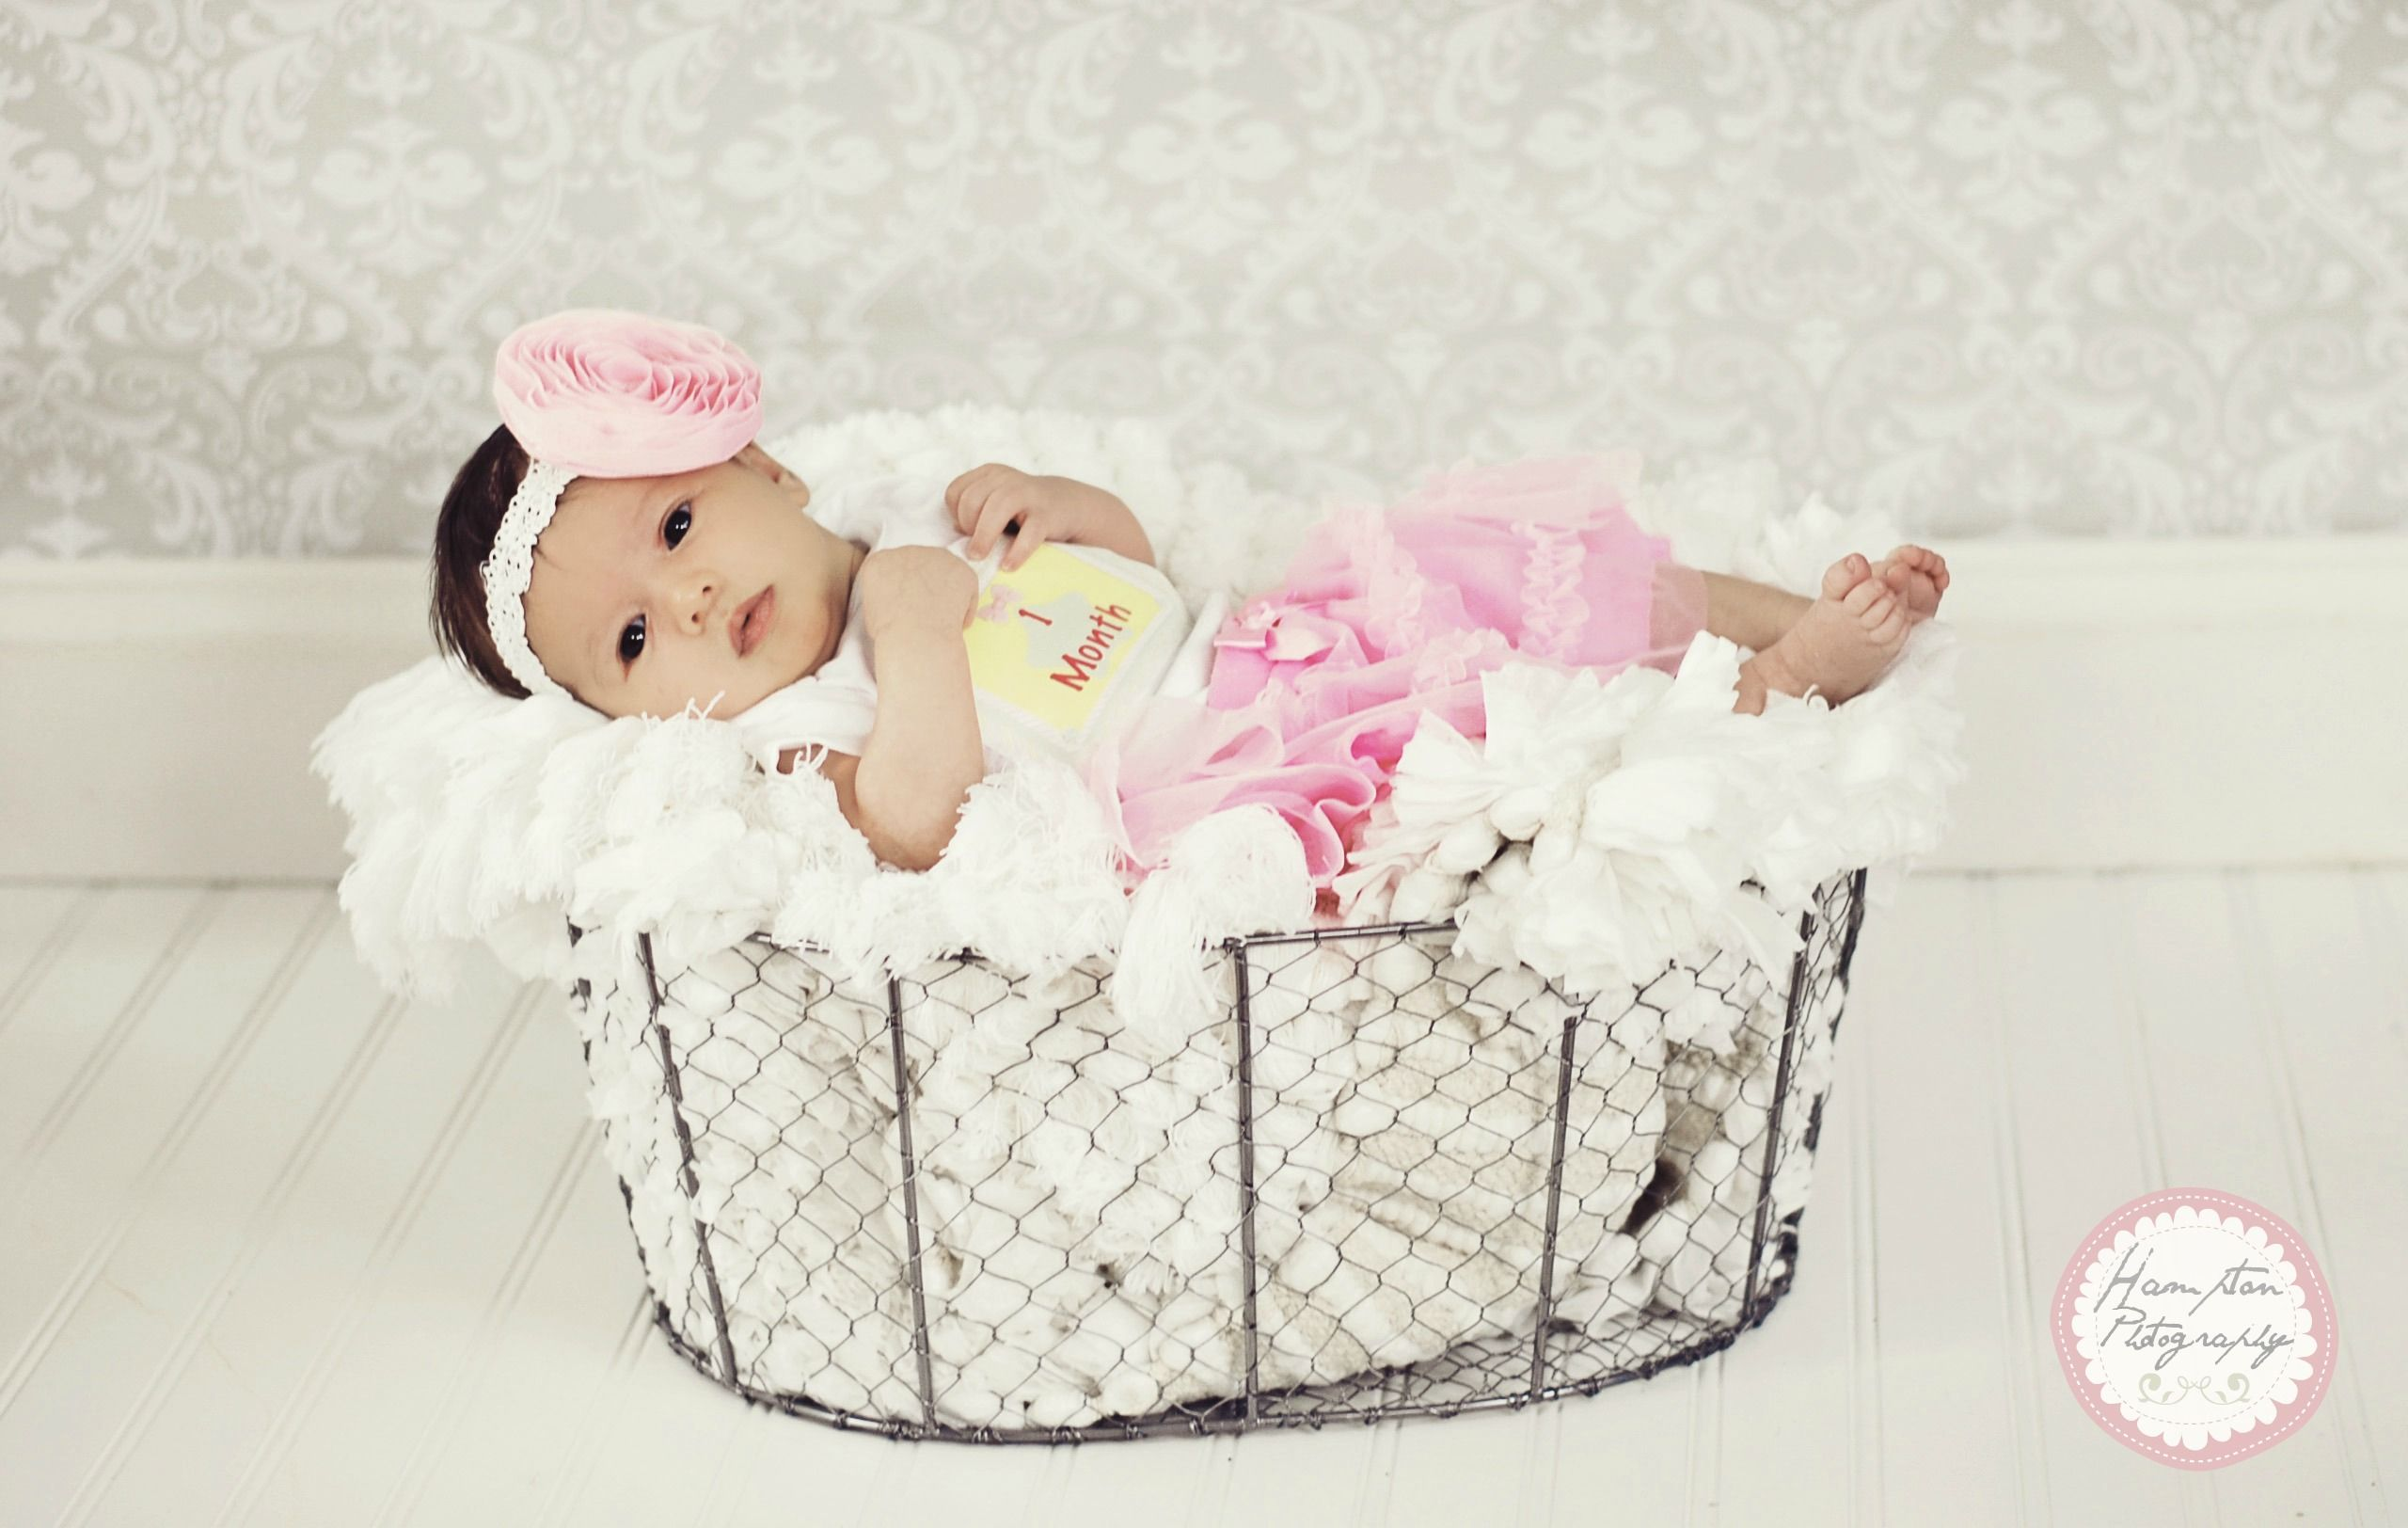 Newborn baby girl photo prop ideas wire basket tu tu 1 month old diy handmade headband by me